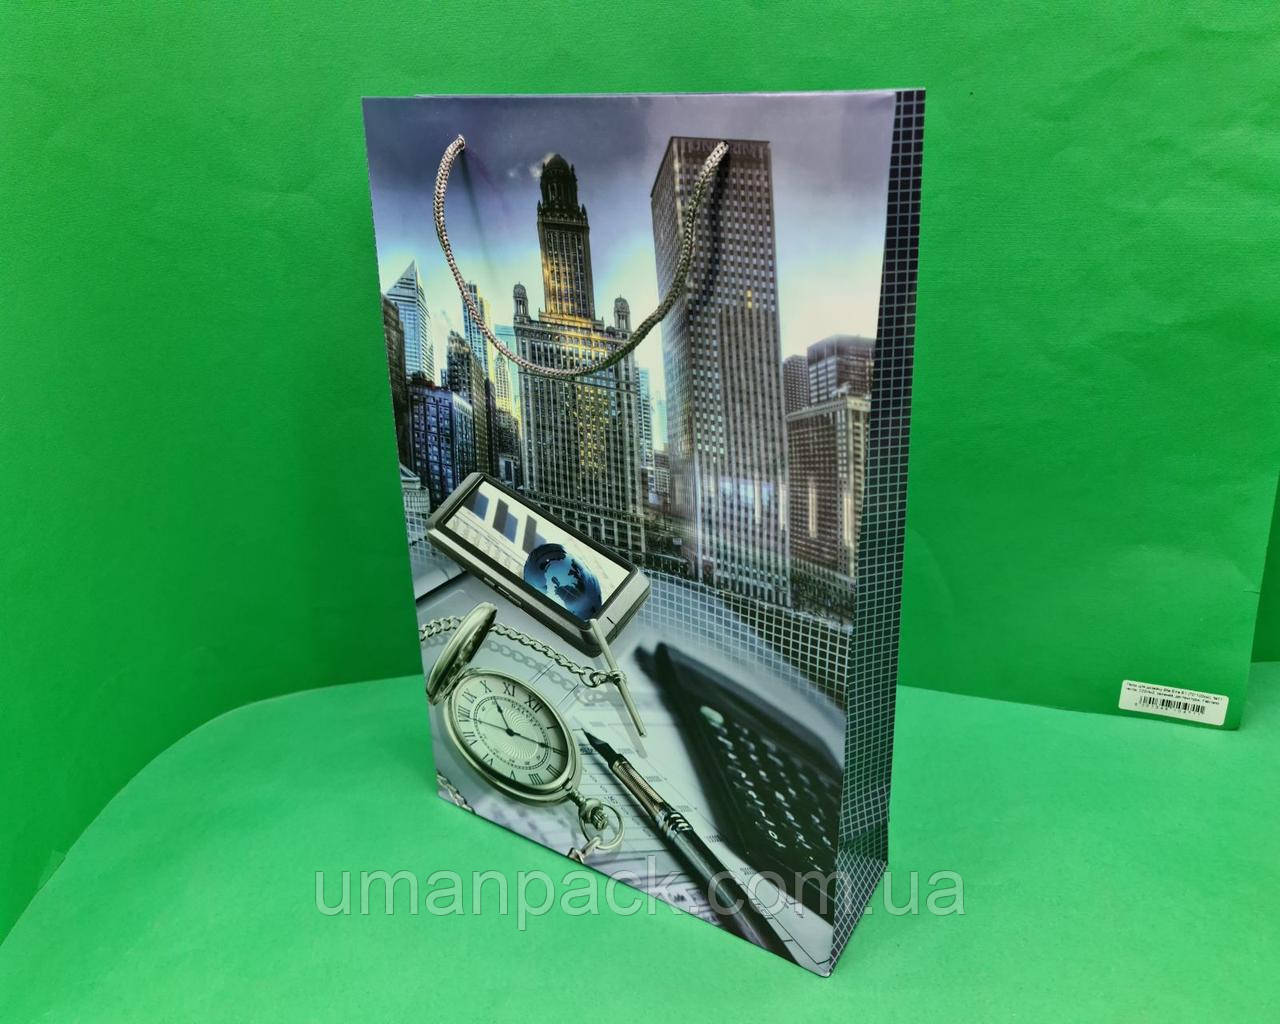 Пакети паперові великий вертикальний 25/37/8(артBV-046) (12 шт)